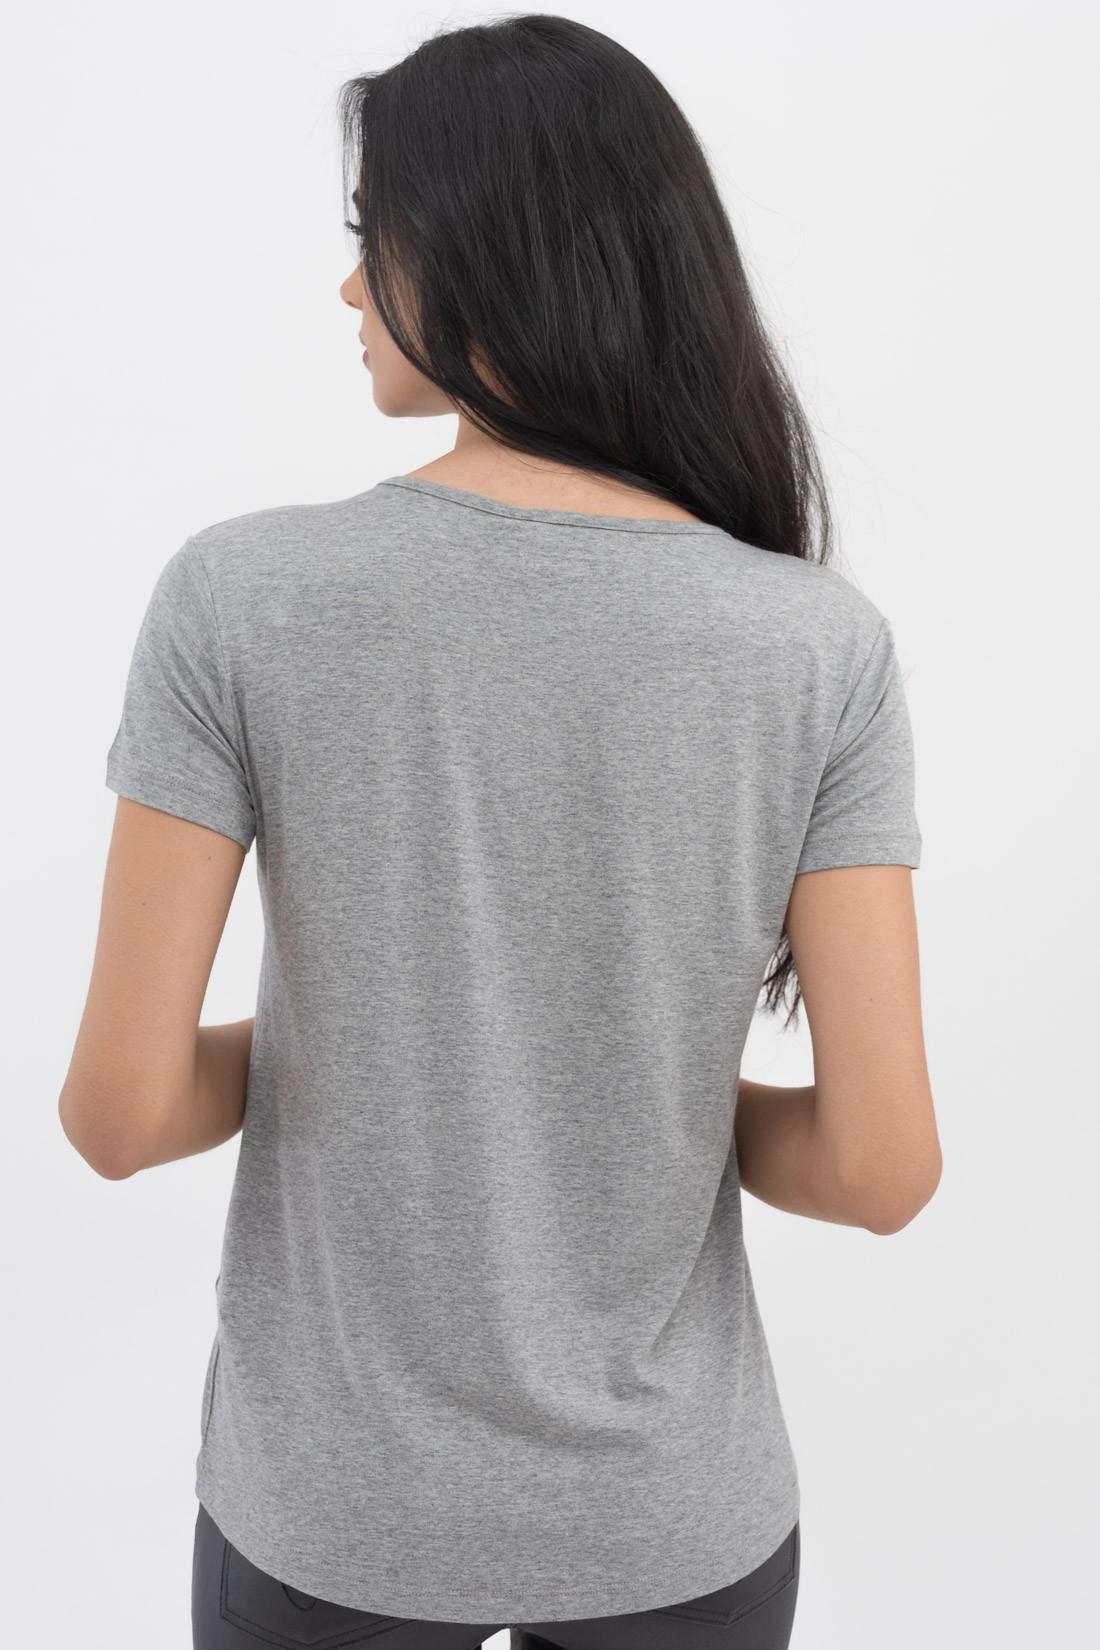 T Shirt Slywear Collect Moments